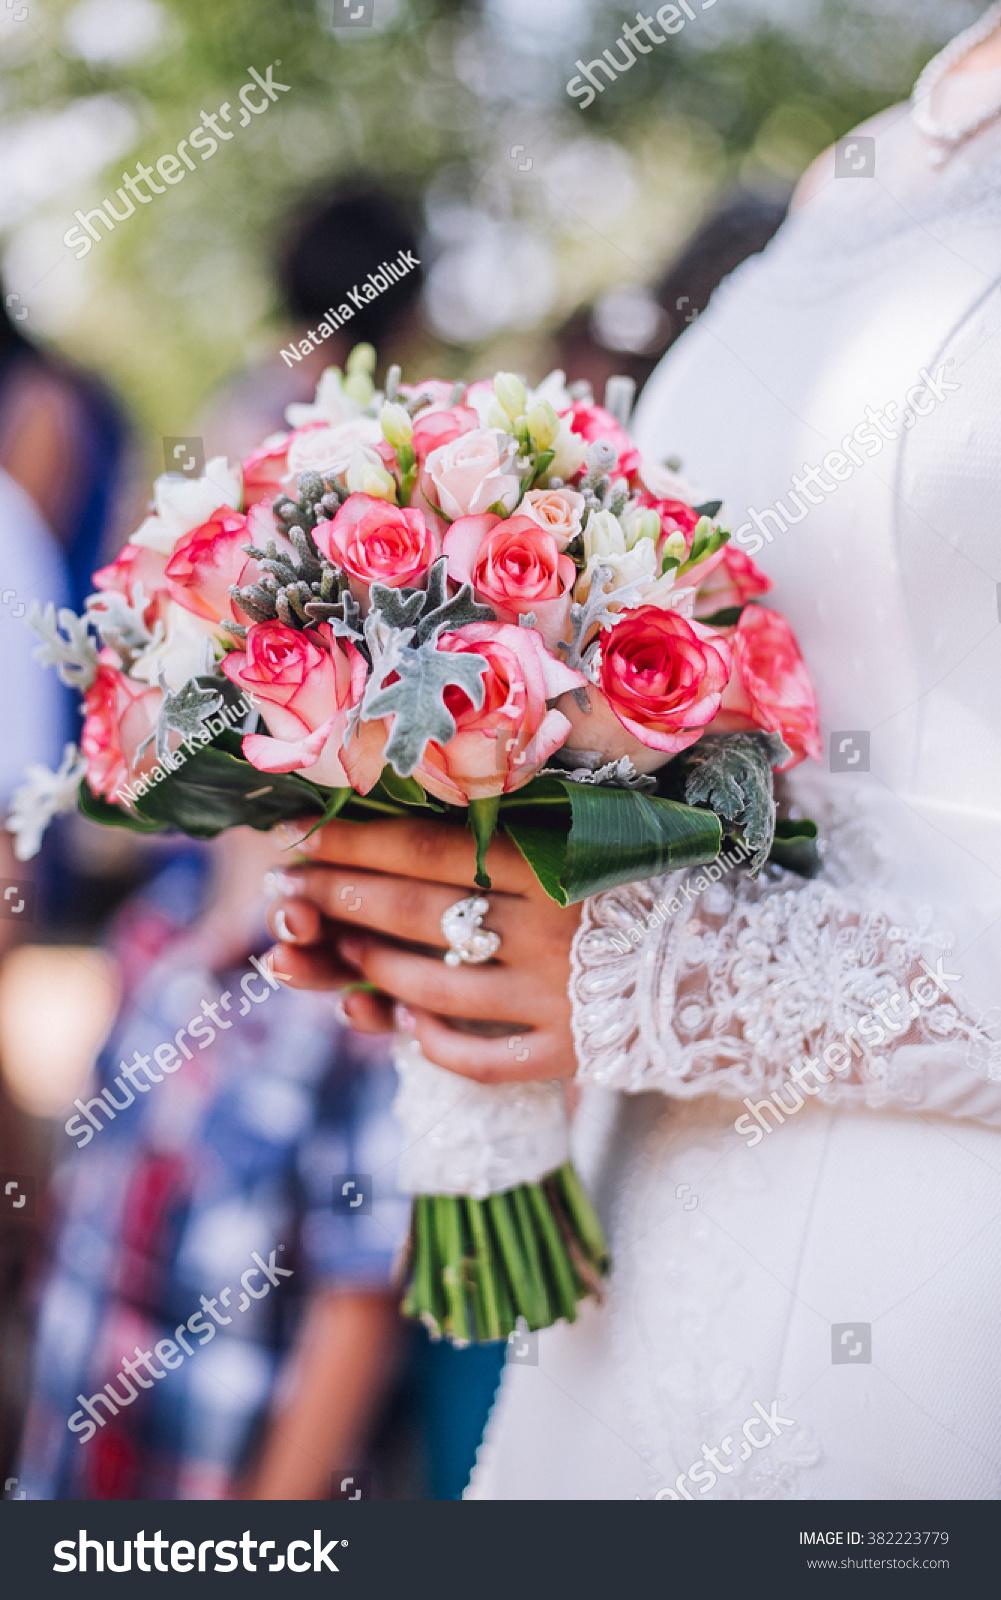 Impressive Beautiful Wedding Flowers Candy Bar Stock Photo Royalty